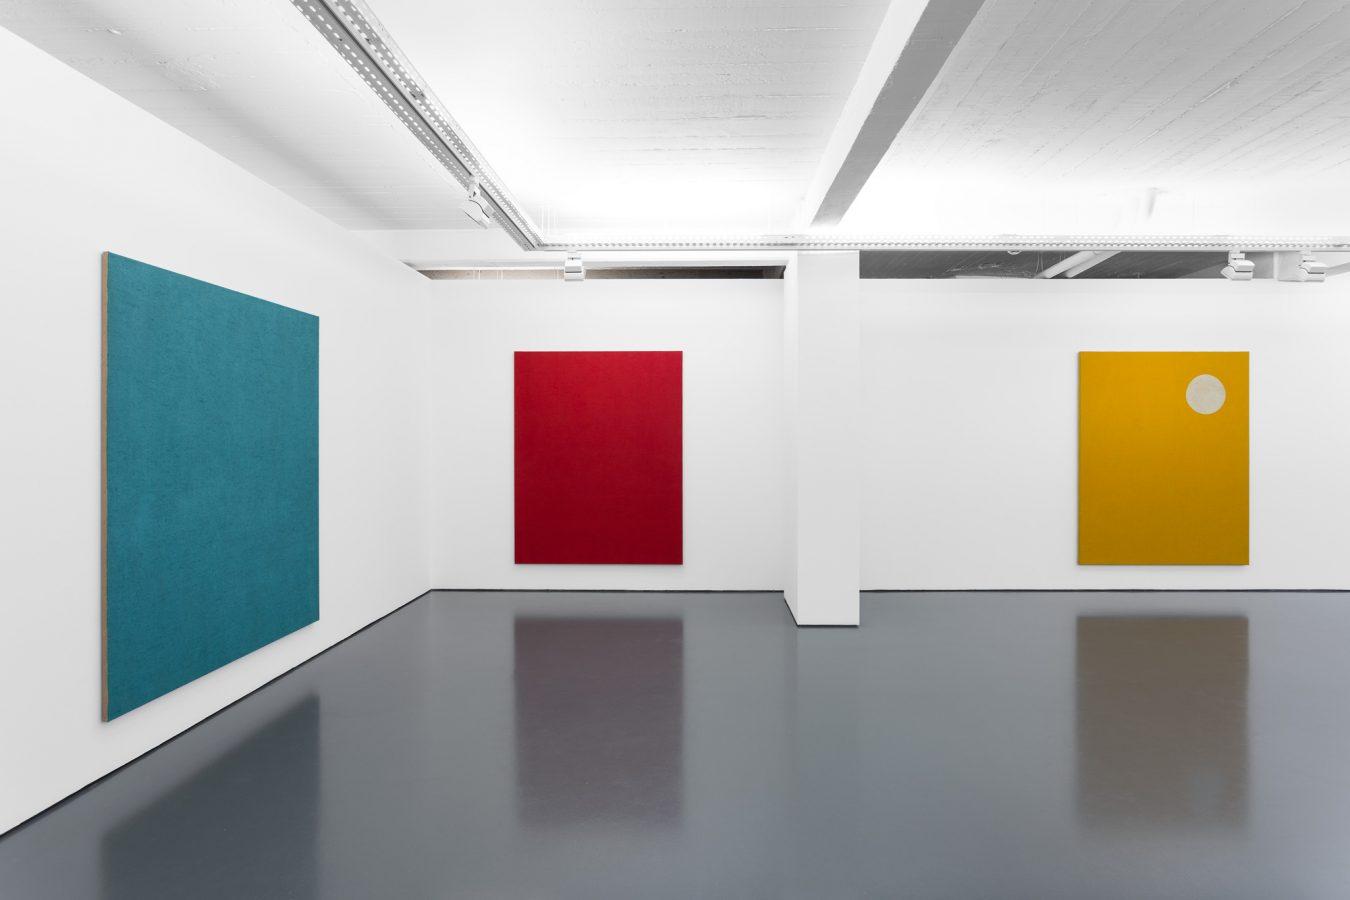 Galeria Pedro Cera – Antonio Ballester Moreno - Everything Cycles